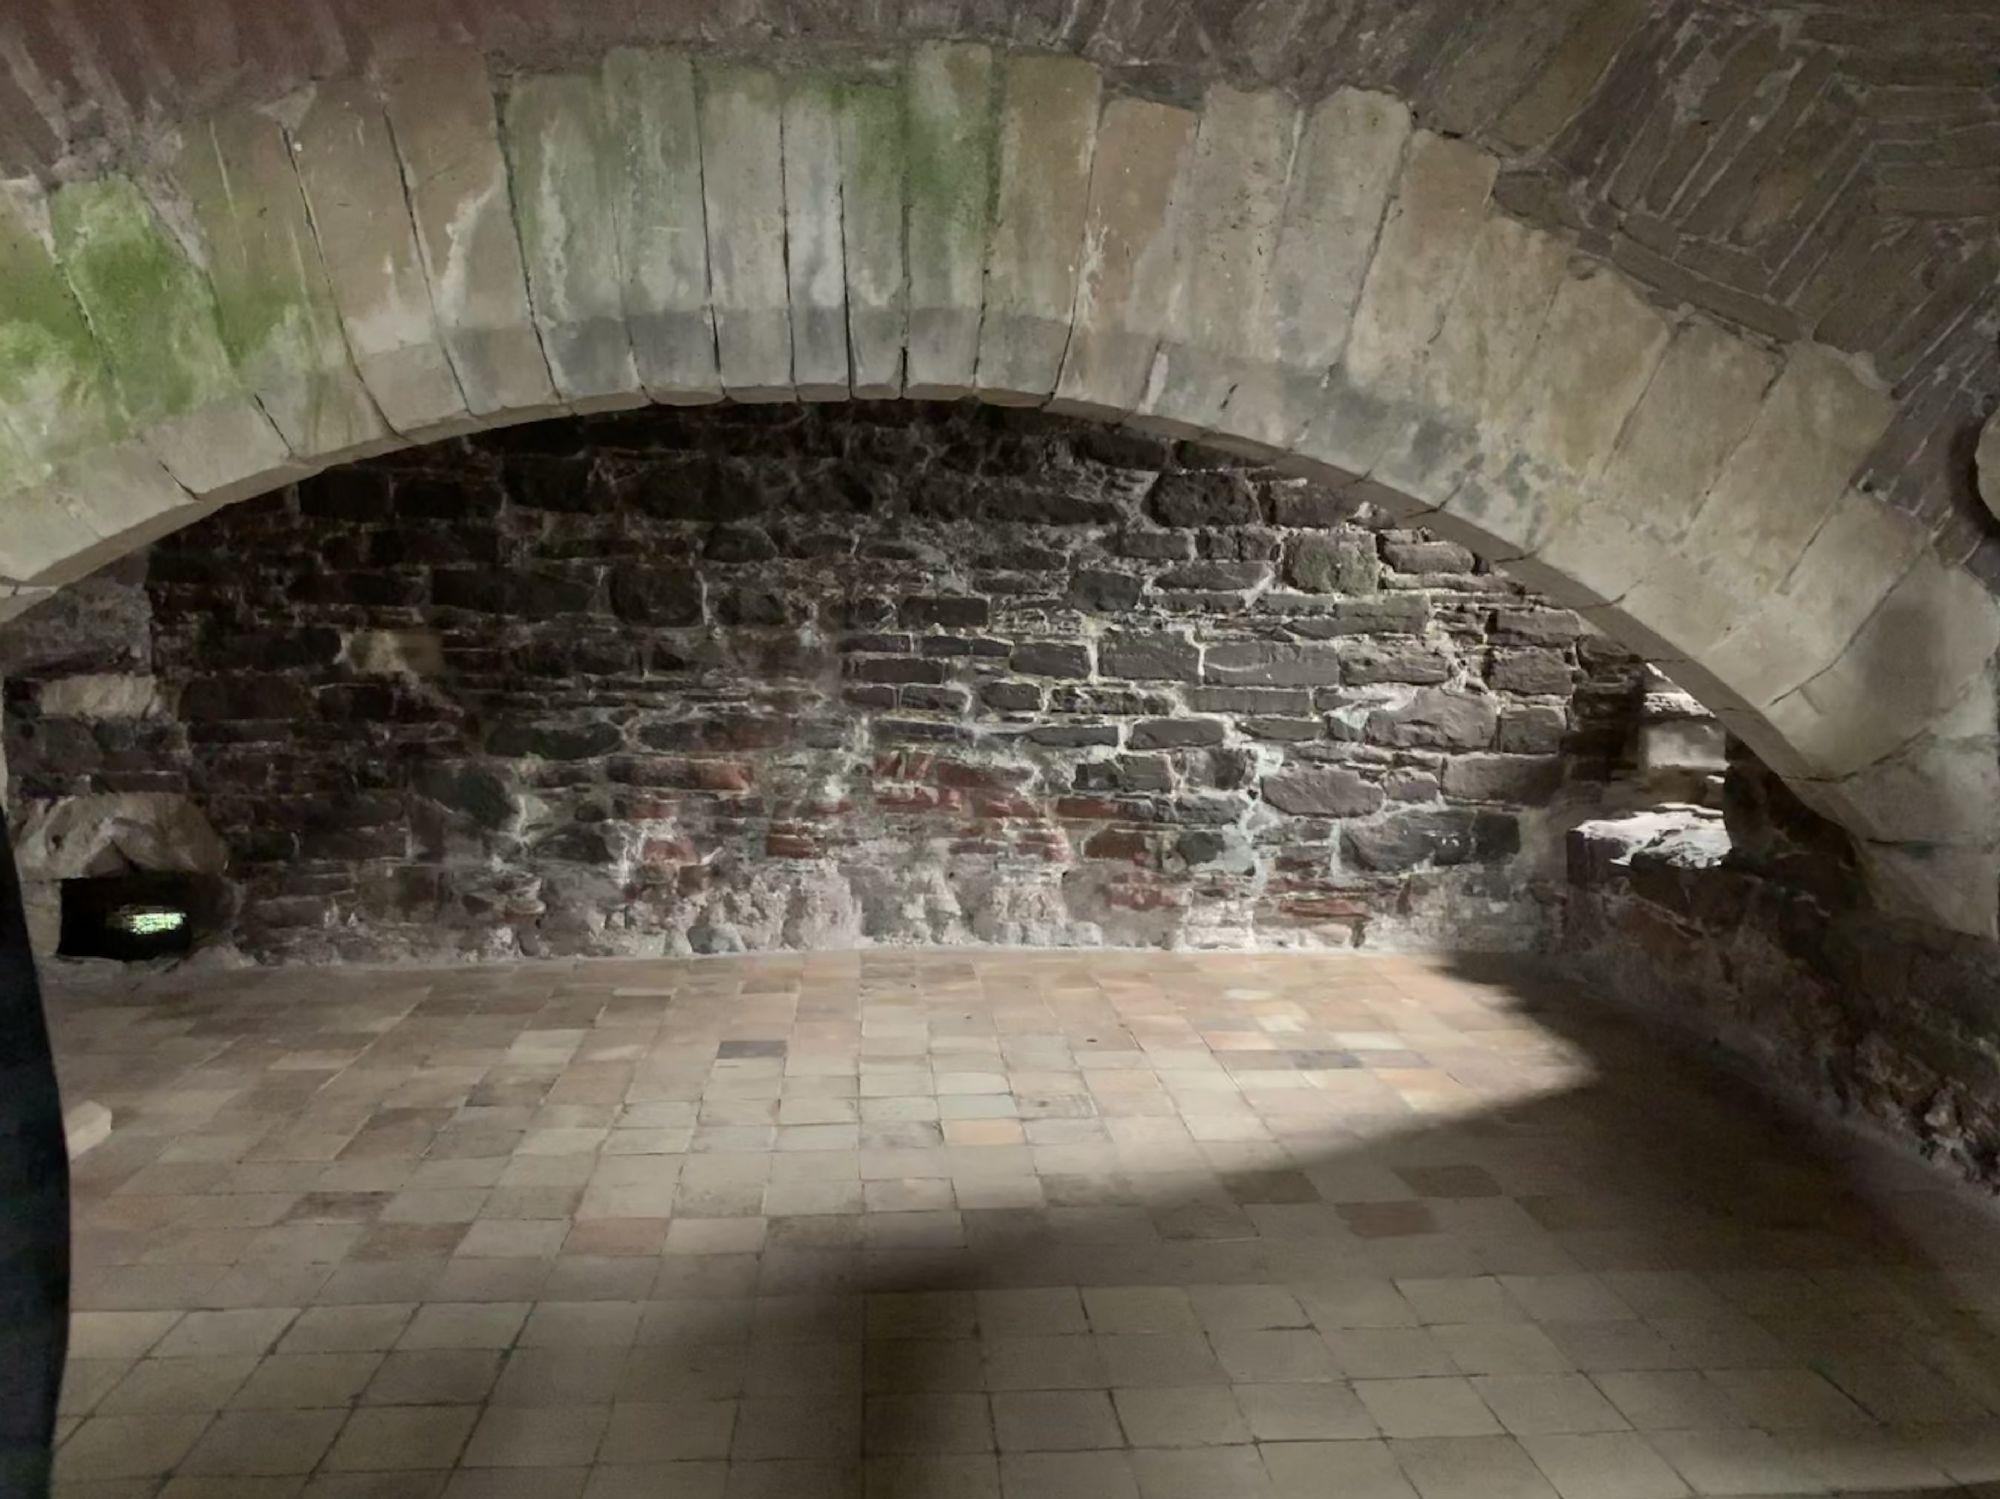 The fireplace Castle Leoch